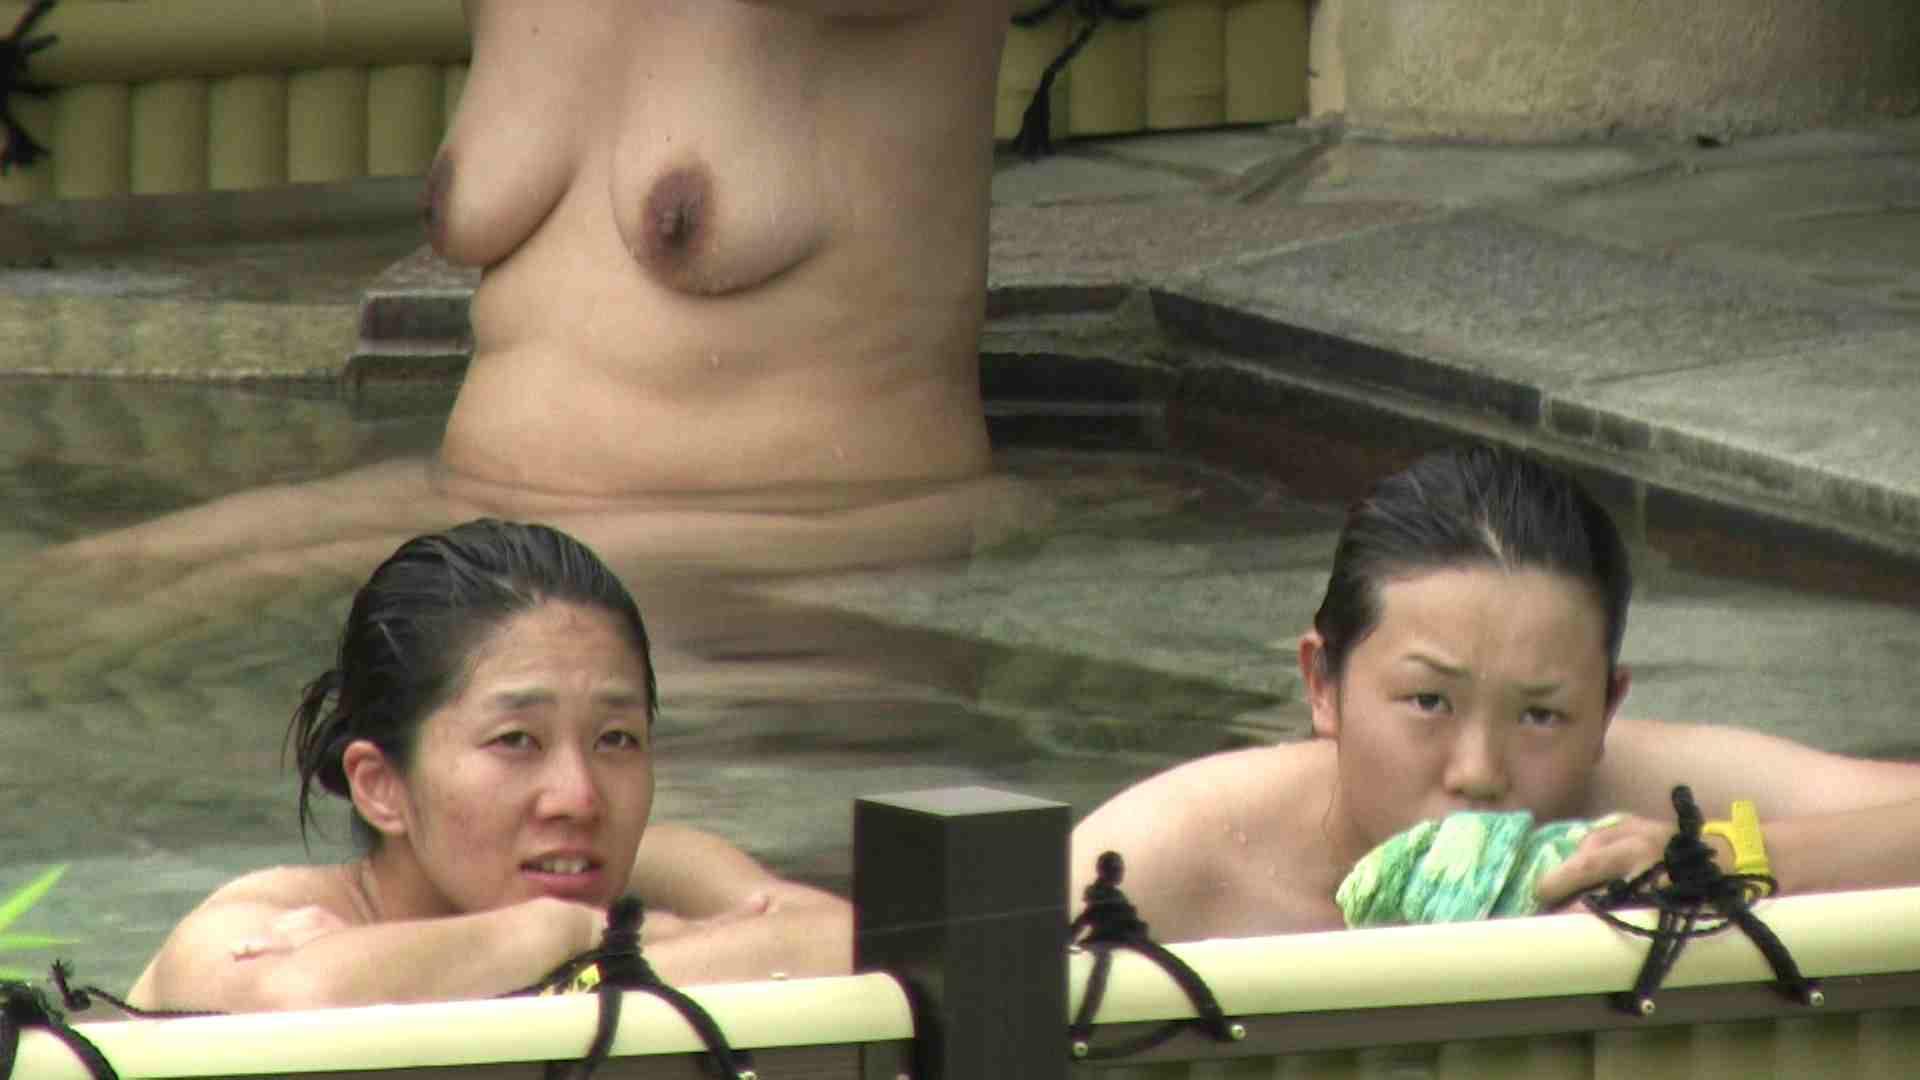 Aquaな露天風呂Vol.205 OLセックス 覗き性交動画流出 105画像 35